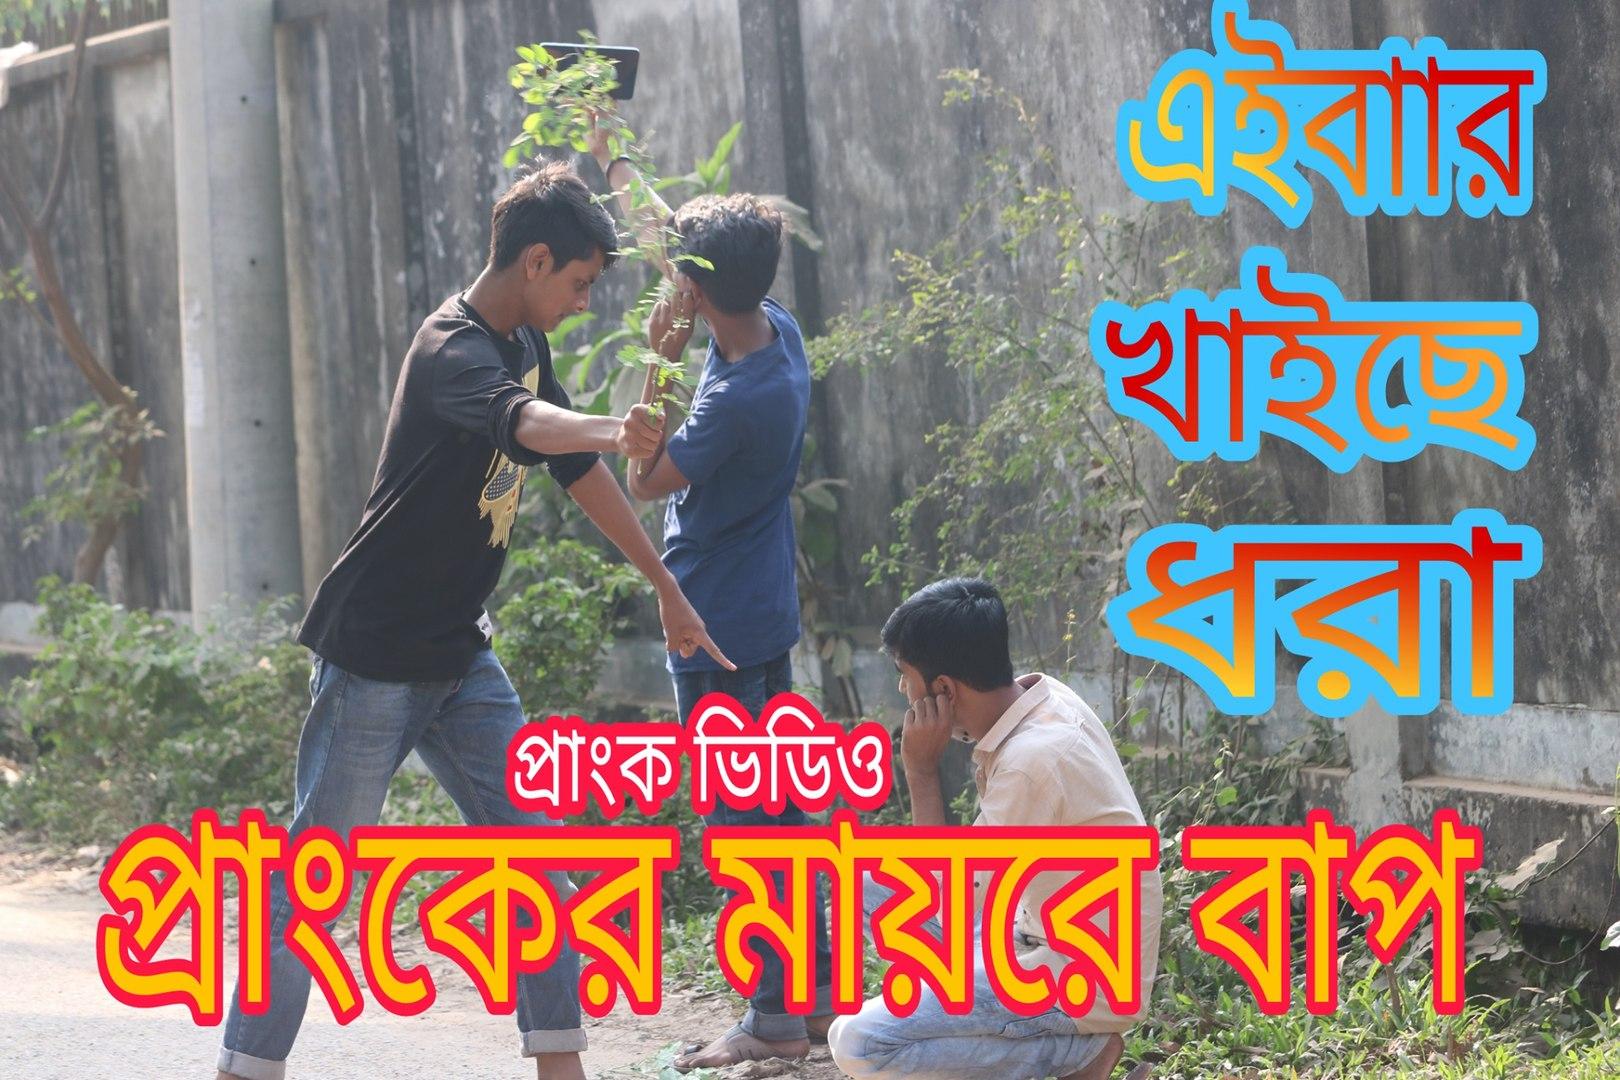 Bangla New Prank Video | Pranker Maayre Bap | Bangladeshi Prank | Prank Videos 2017 | Prank Star